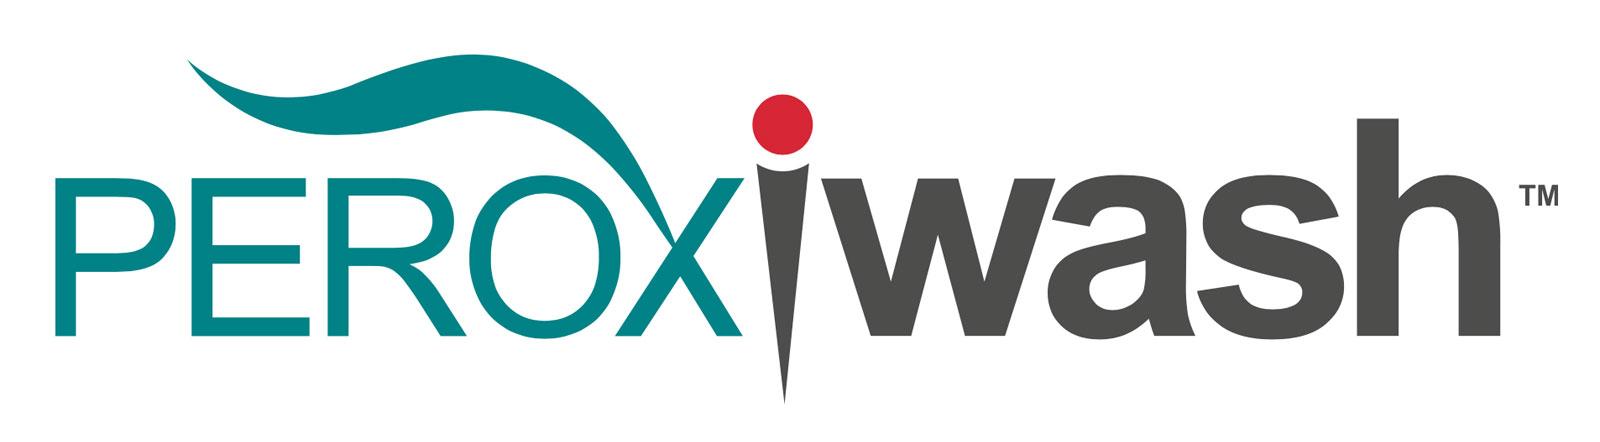 Product-Logo-Peroxiwash.jpg